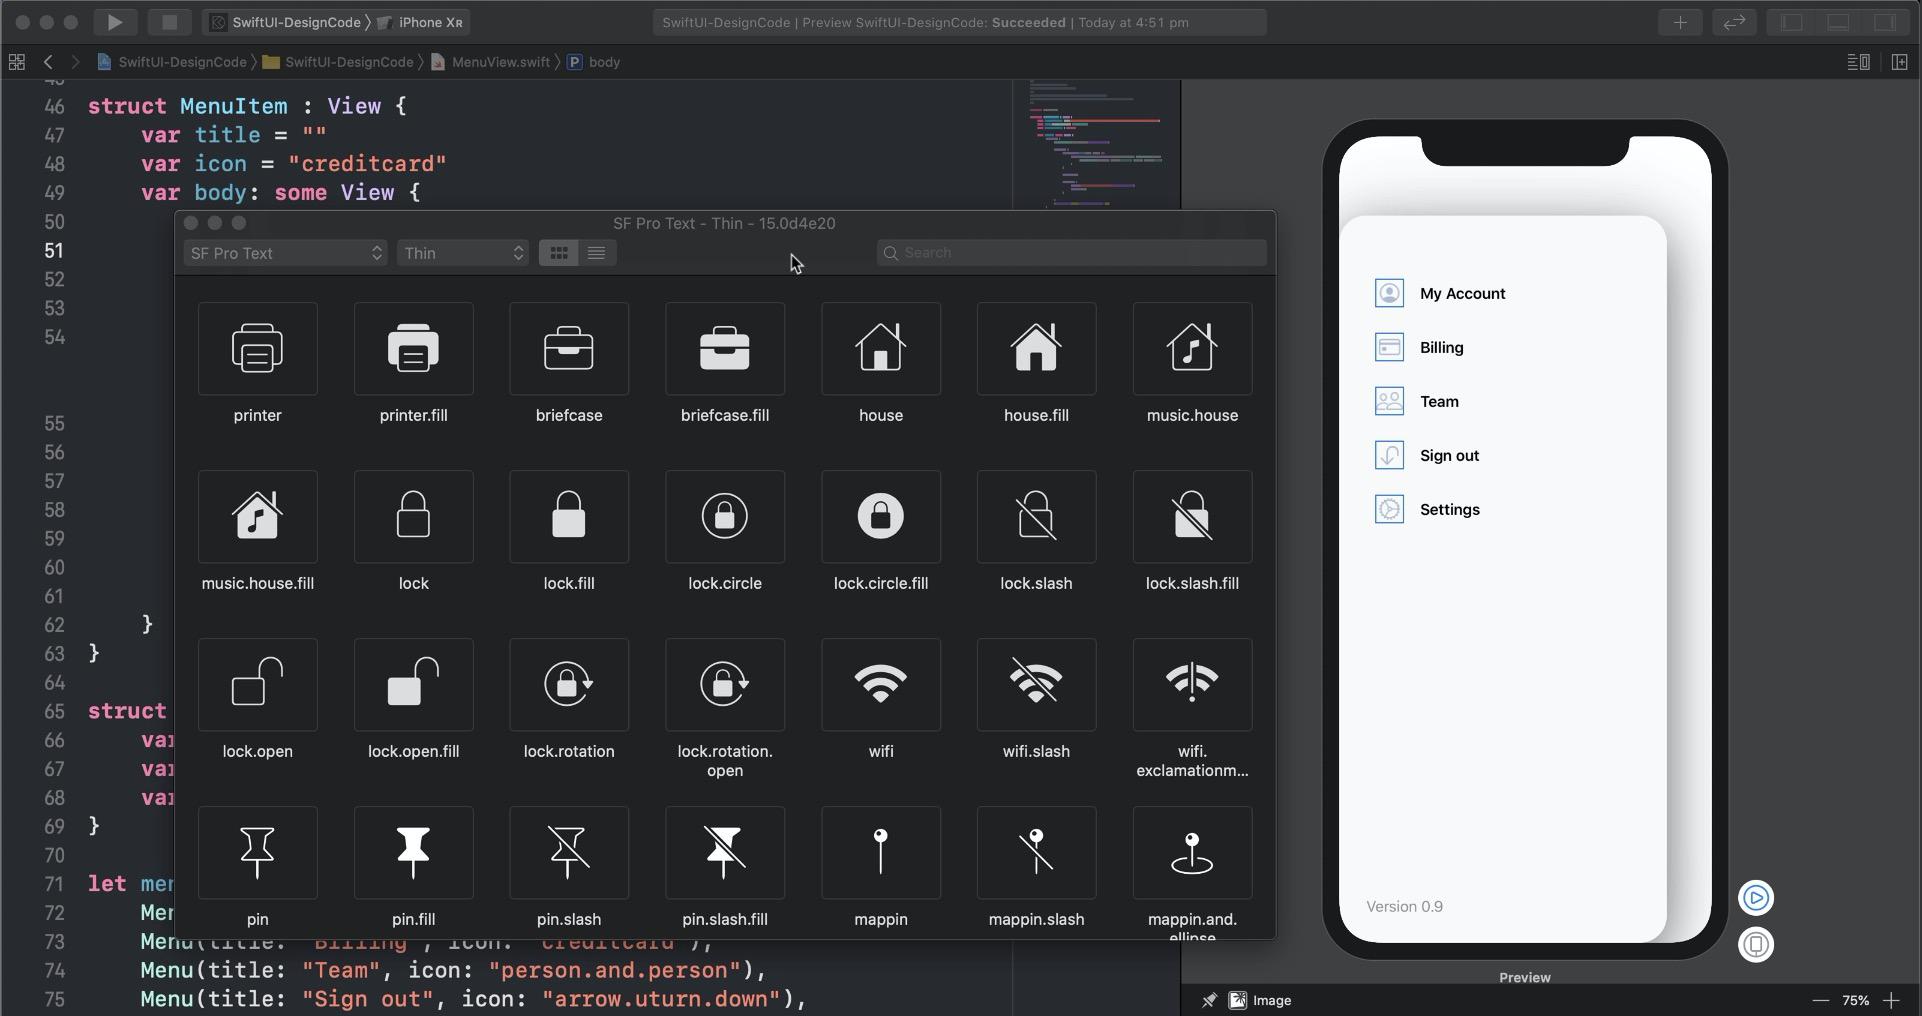 Learn SwiftUI for iOS 13 - Design+Code